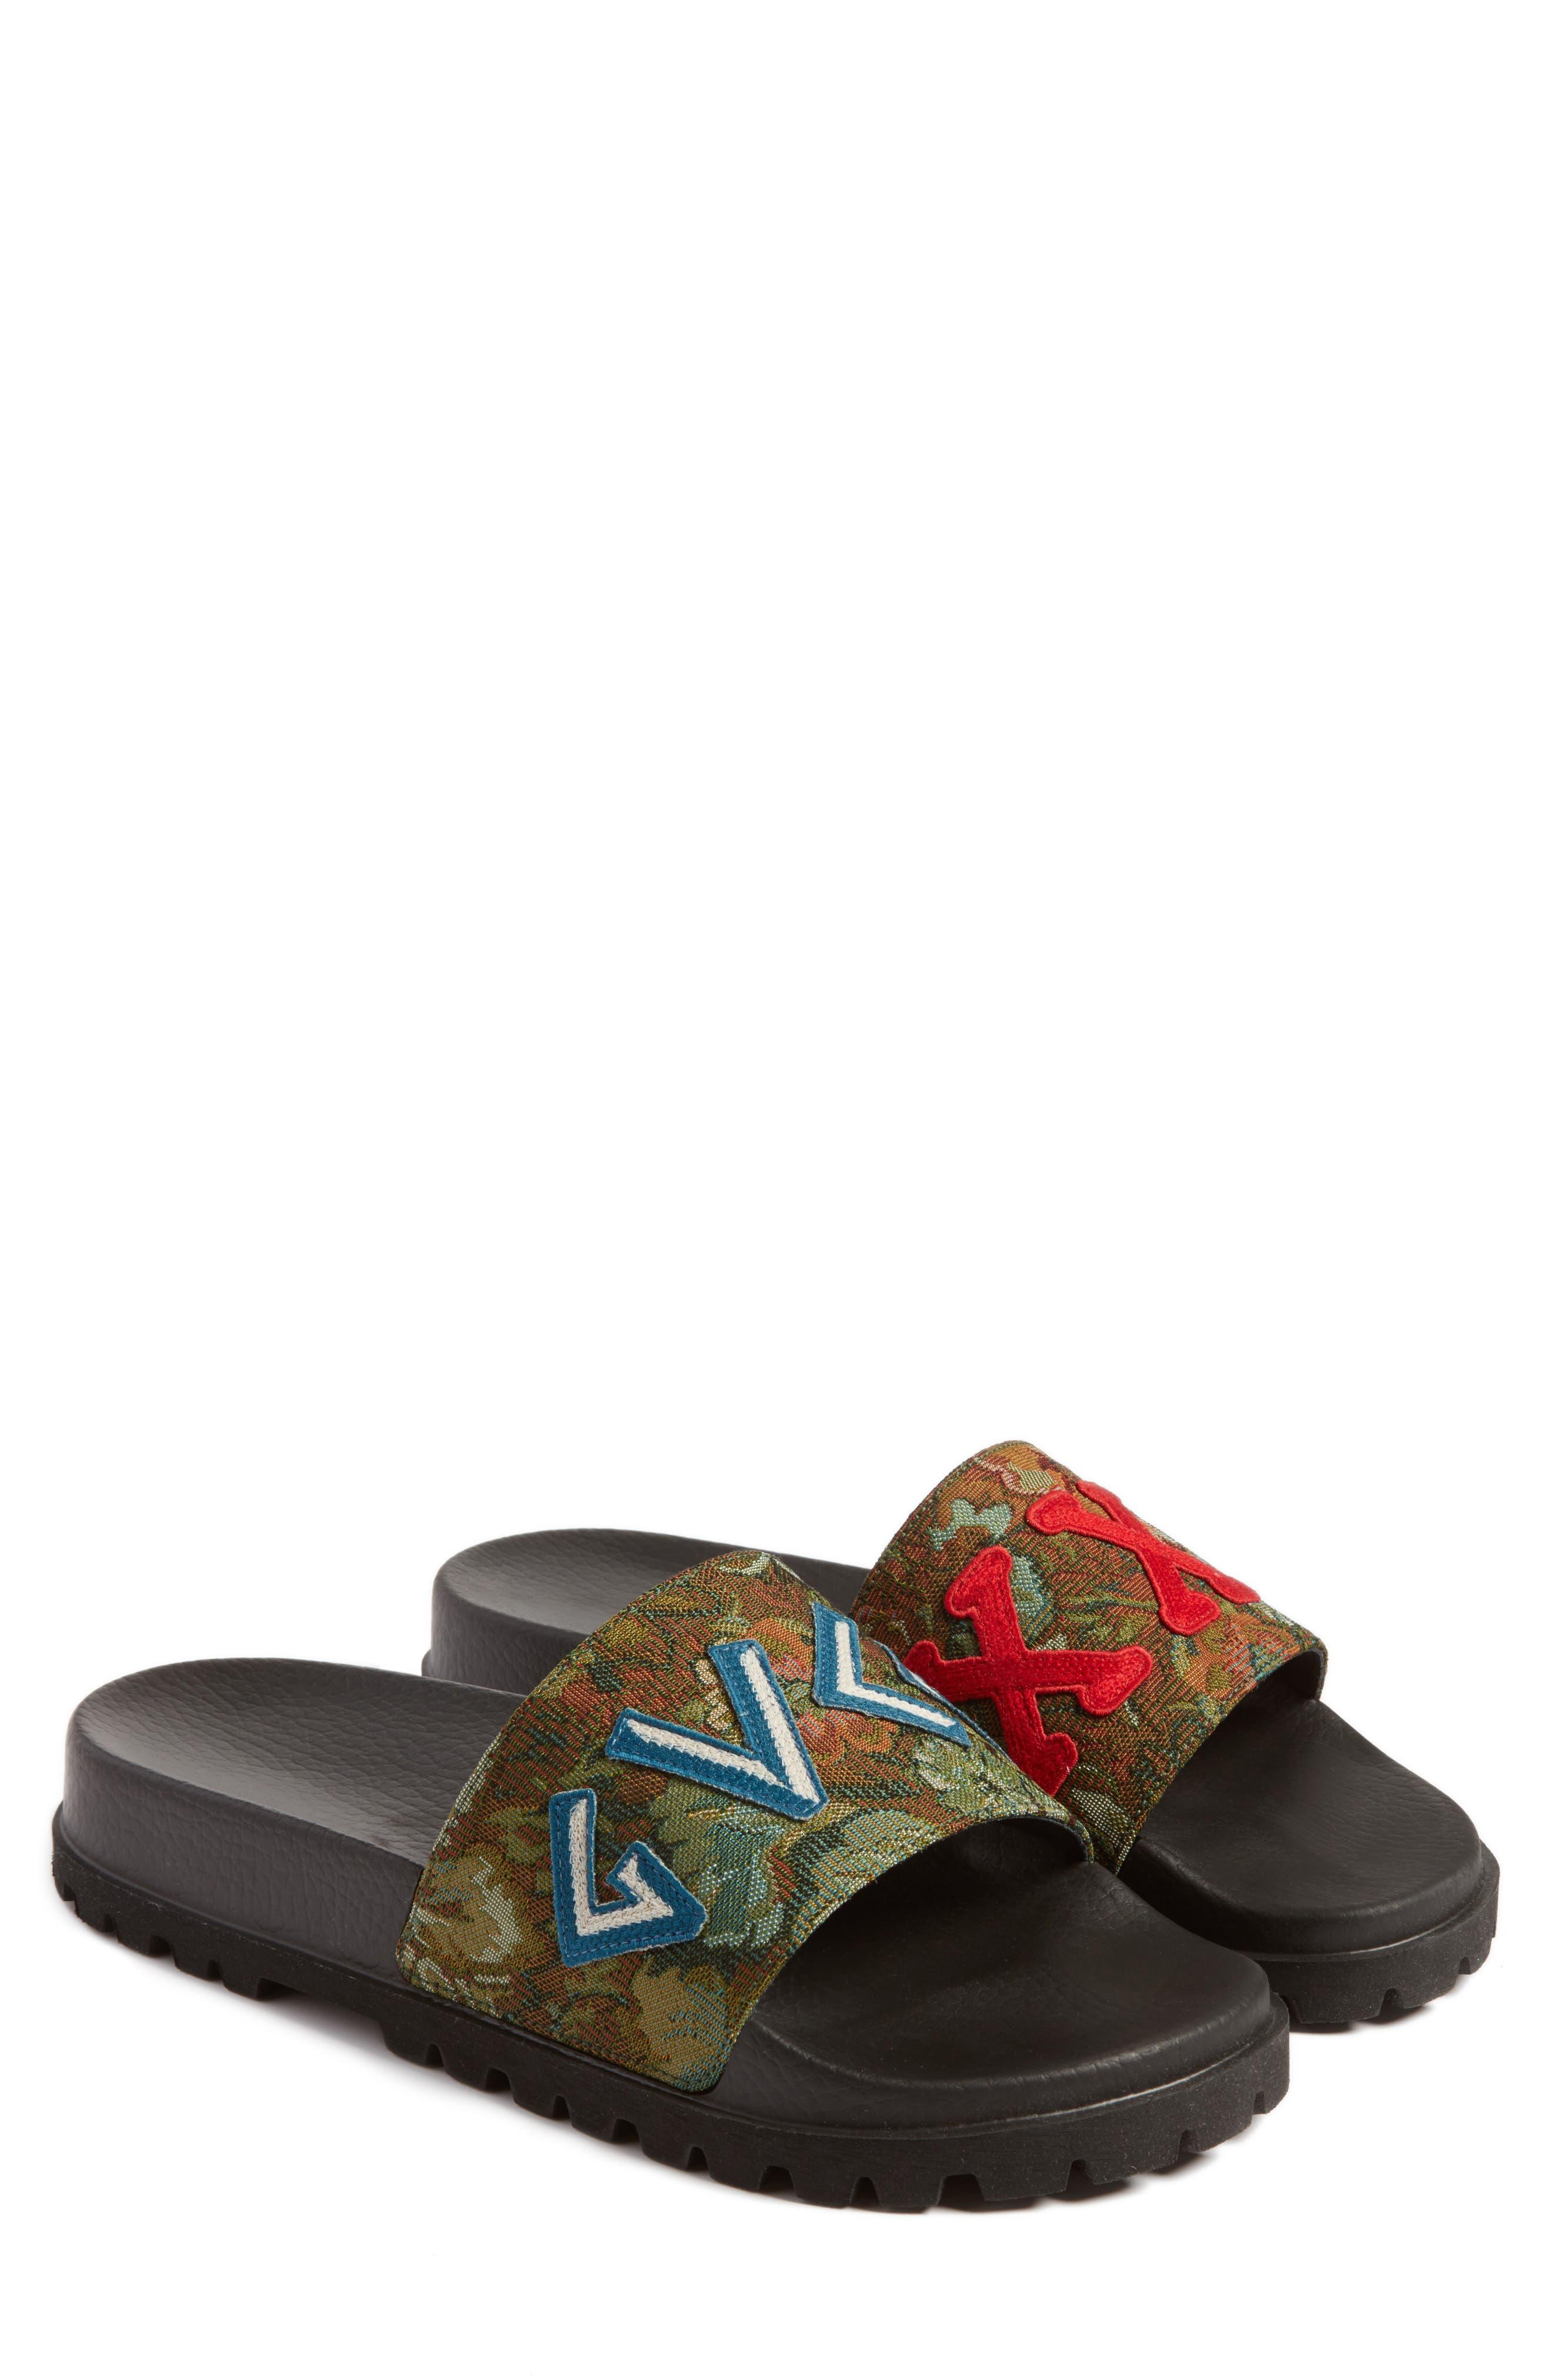 'Pursuit Treck' Slide Sandal,                         Main,                         color, Green Multi